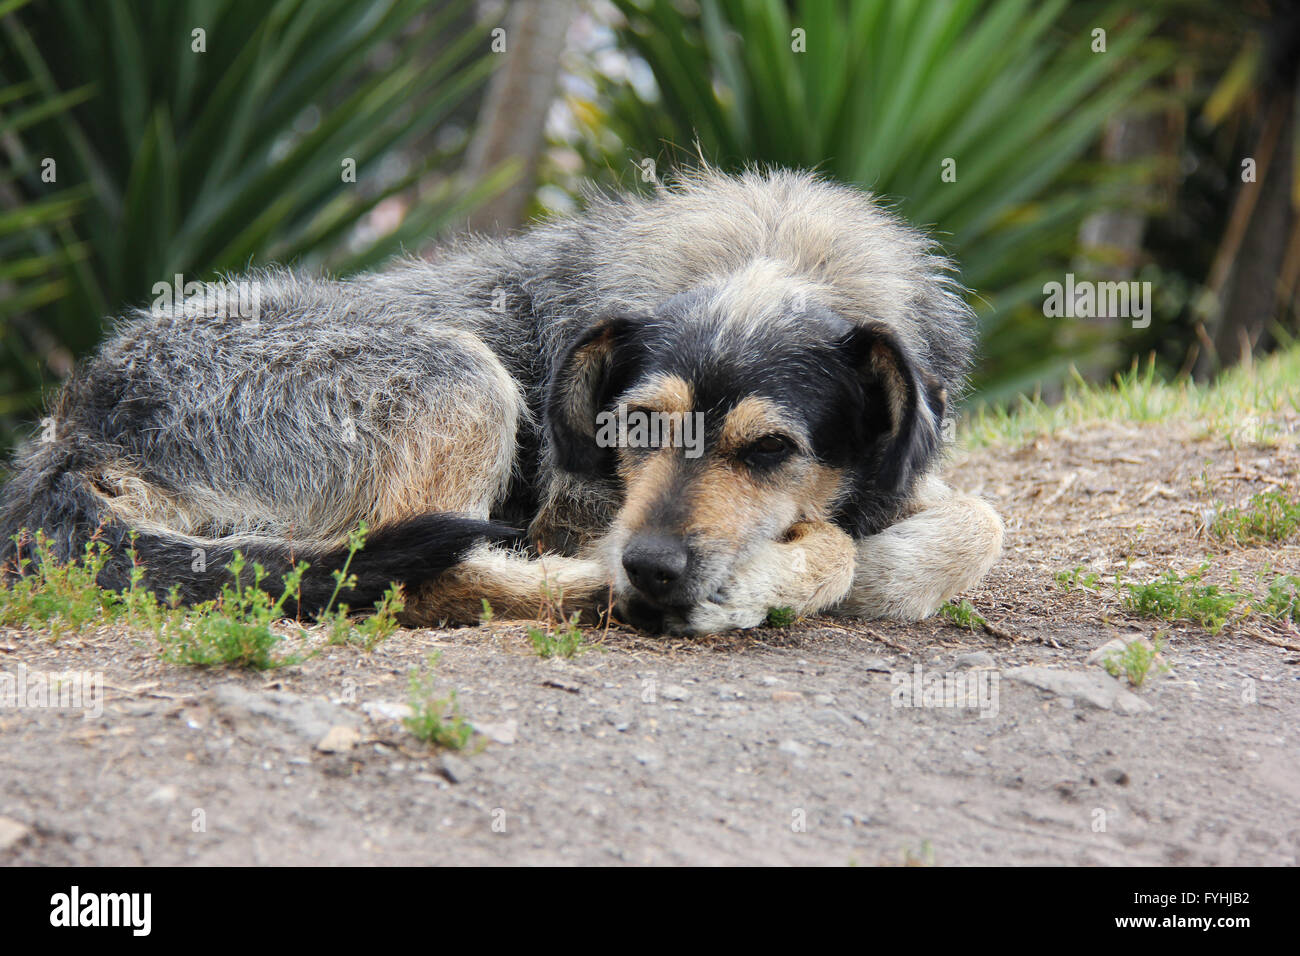 Abandoned dog at Zipaquirá - Stock Image